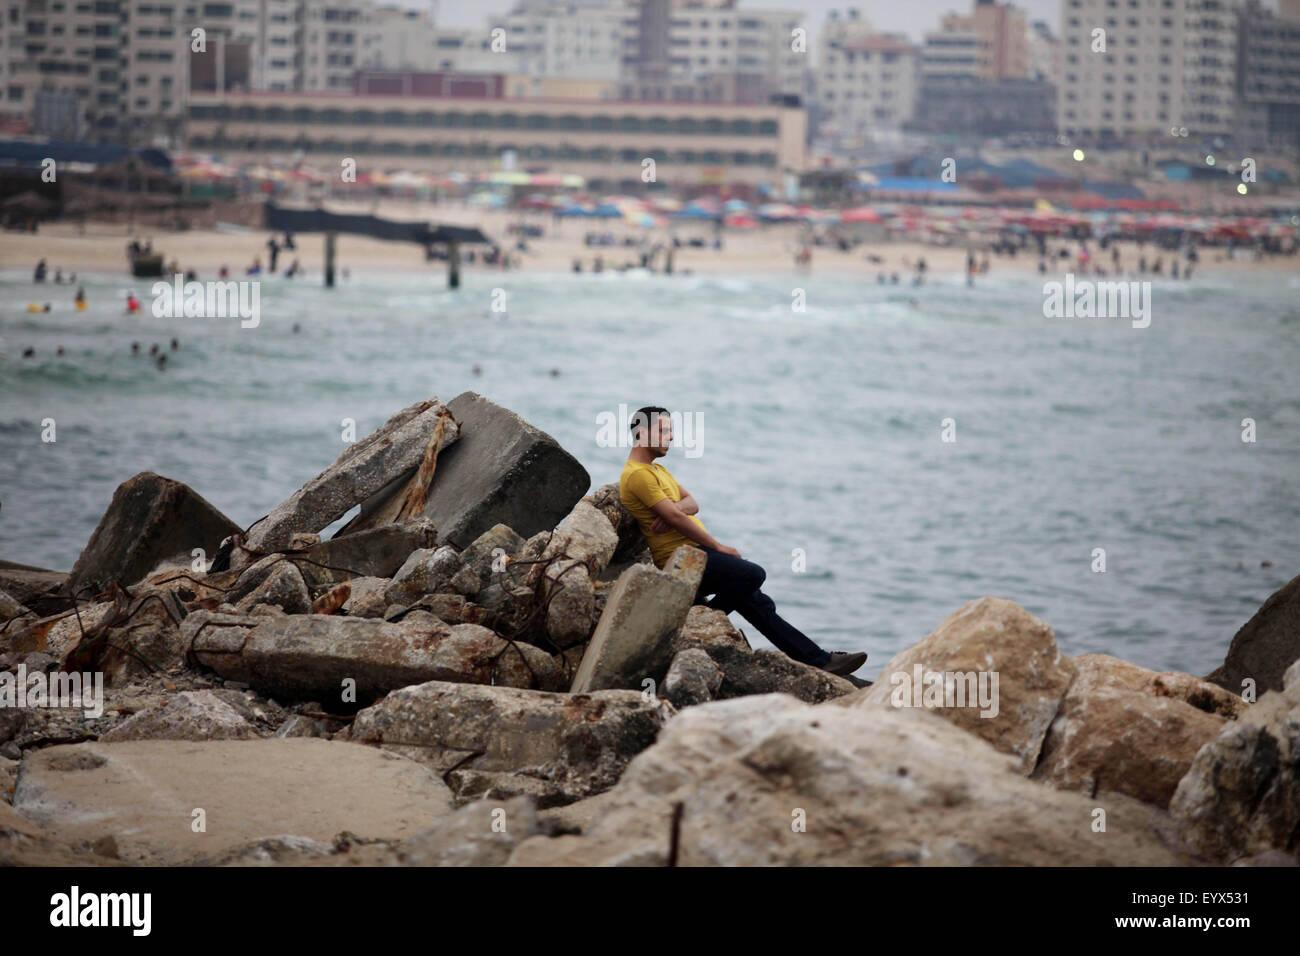 Gaza City, Gaza Strip, Palestinian Territory. 4th Aug, 2015. A Palestinian man sits on the coast of the Mediterranean - Stock Image